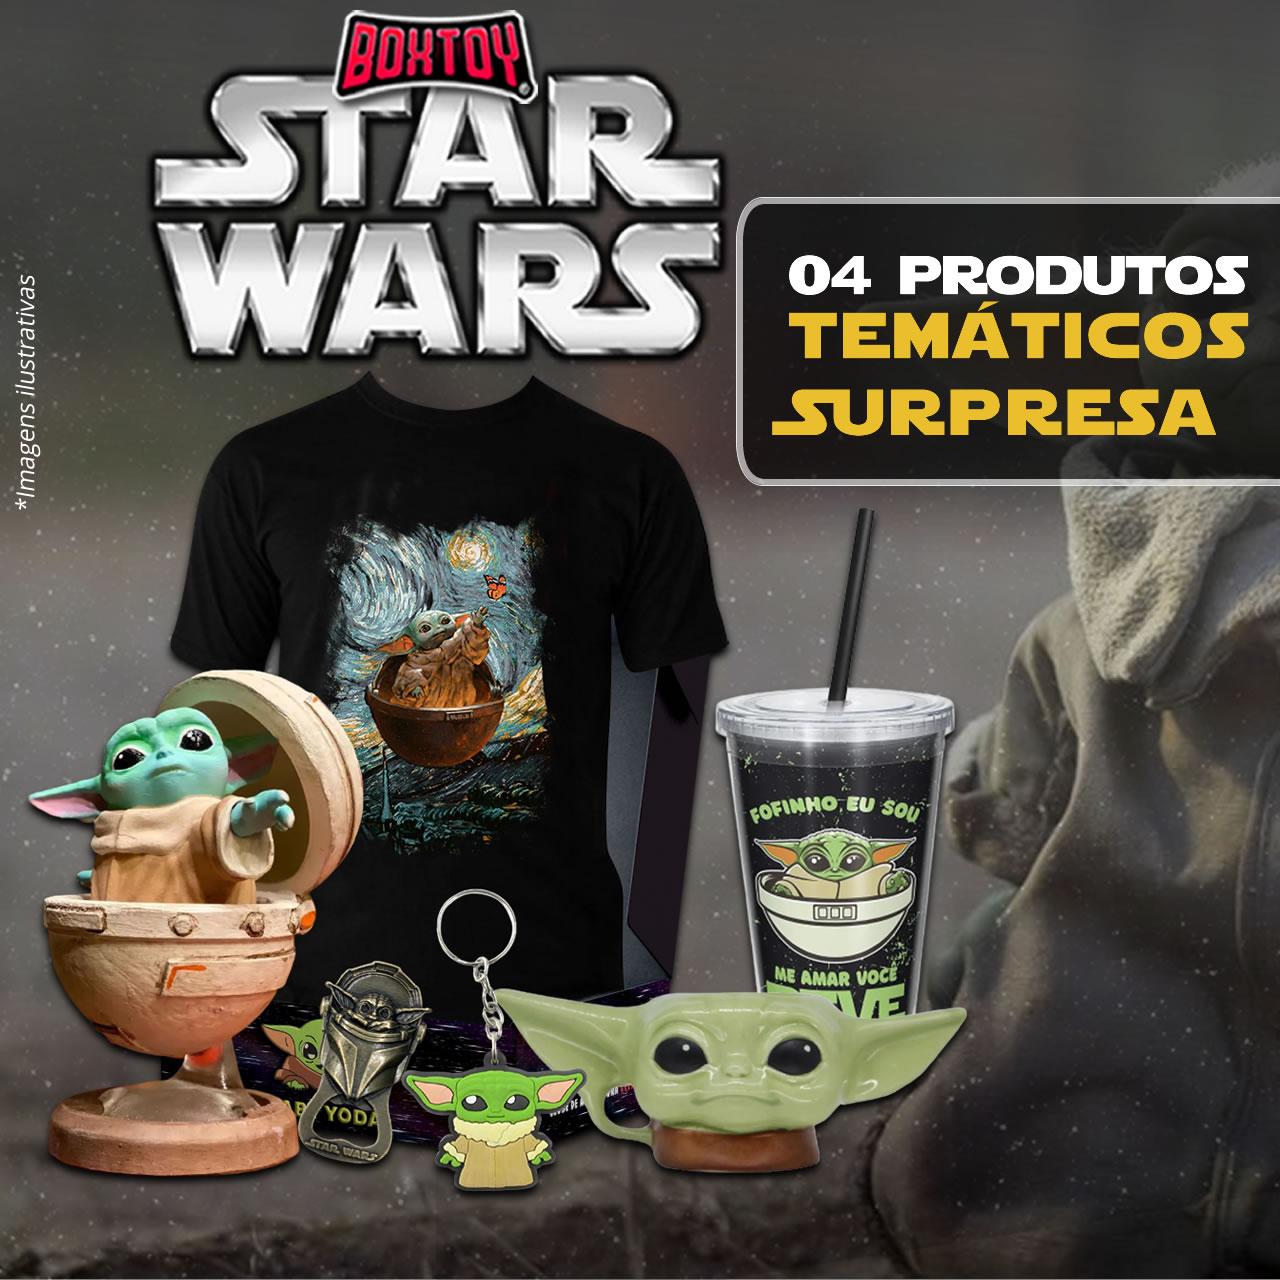 Kit BoxToy Edição Baby Yoda Grogu The Child O Mandaloriano The Mandalorian: Disney +